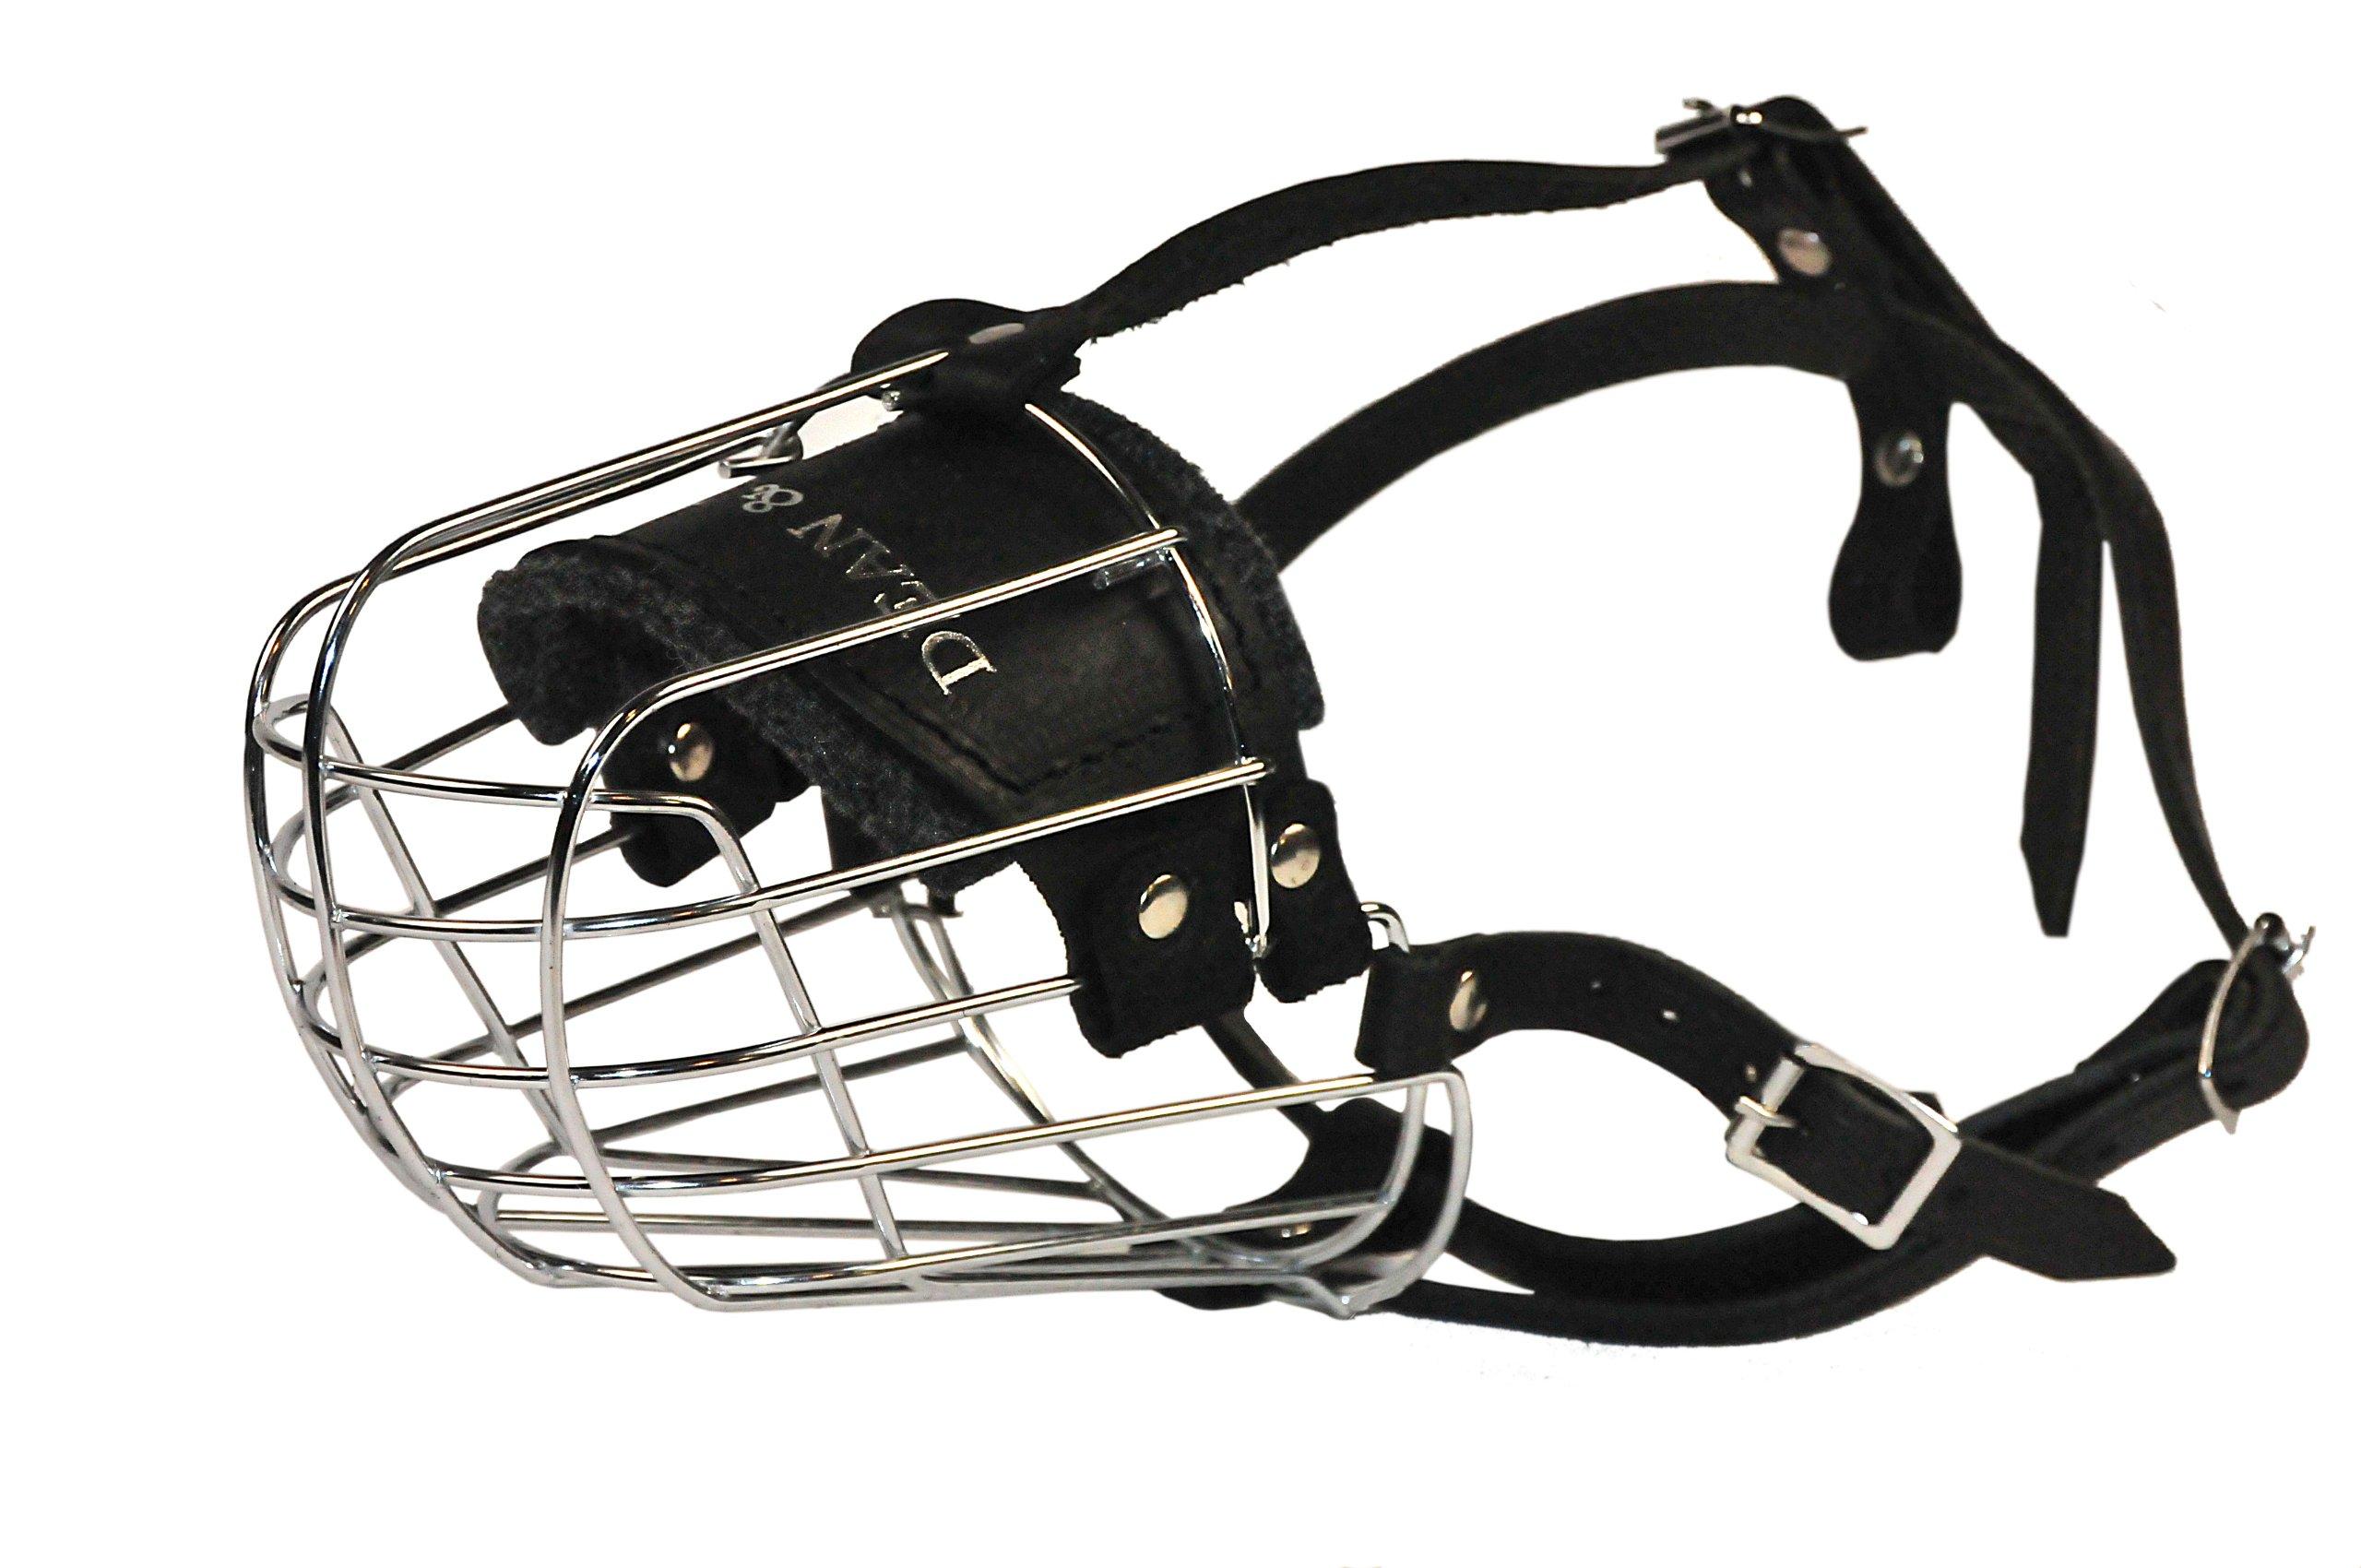 Dean and Tyler Wire Basket Muzzle, Size No. 9 - German Shepherd